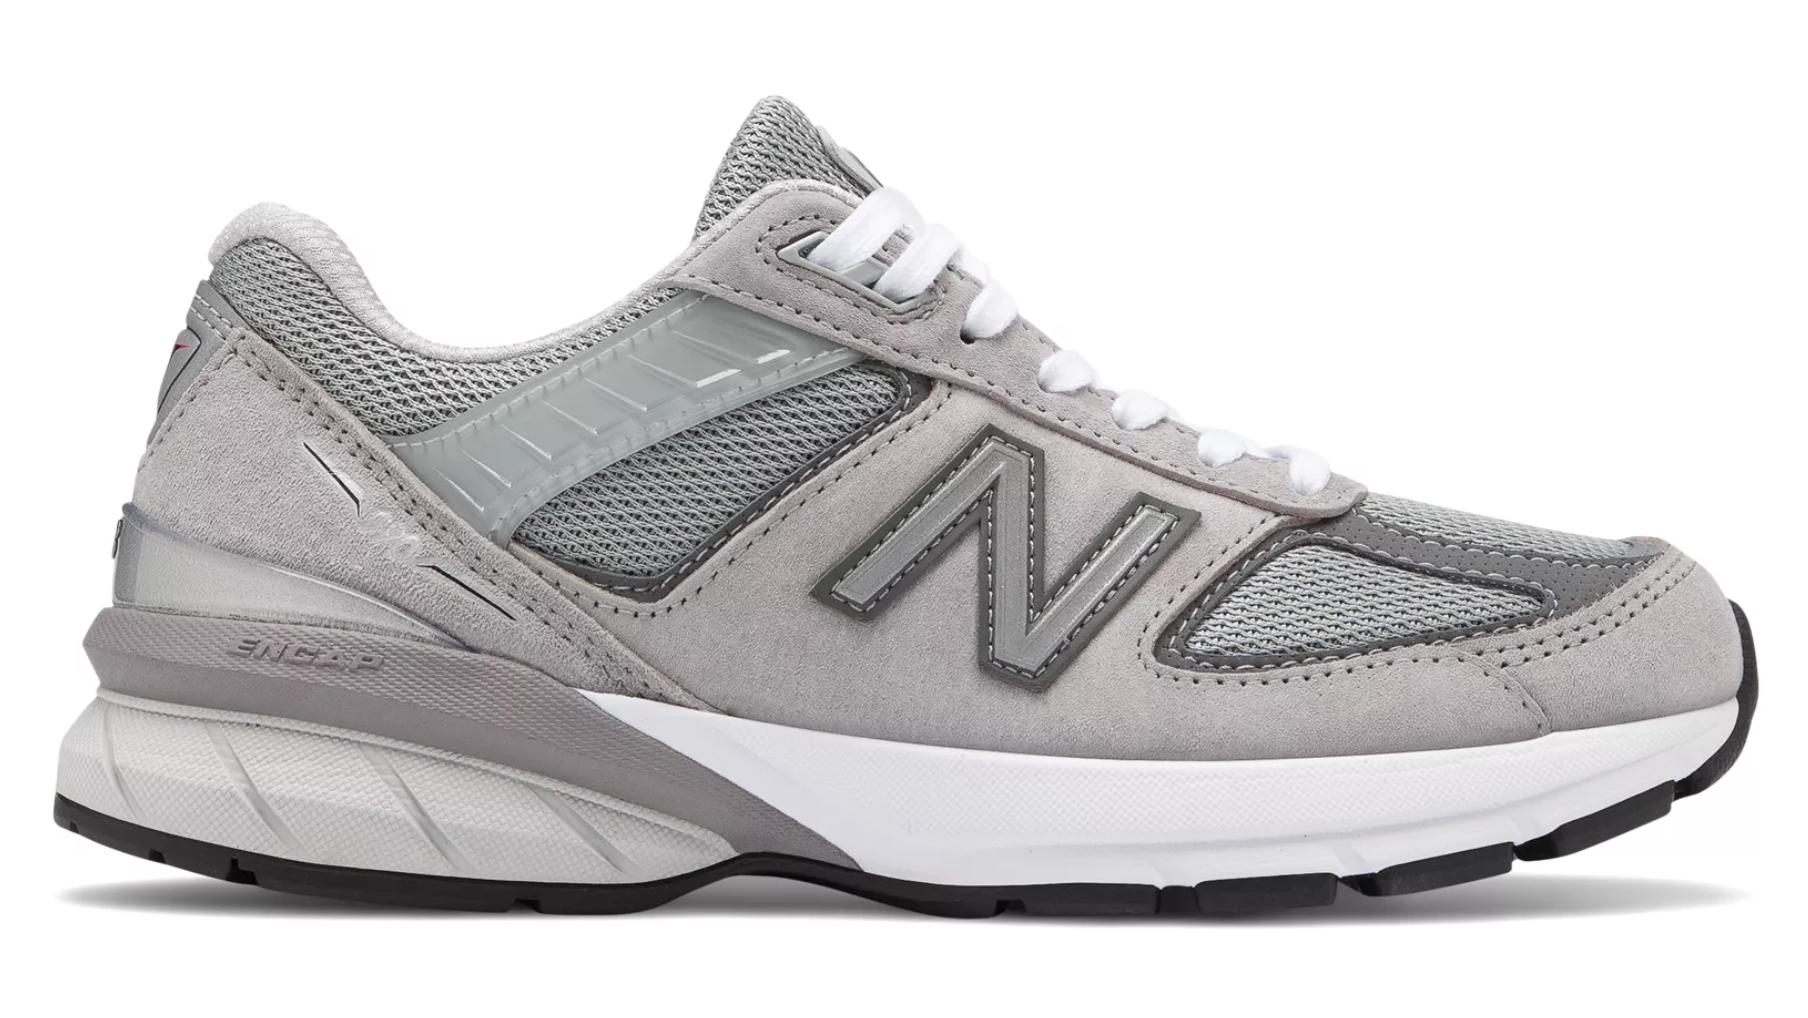 new style 04ba2 0609e Best New Balance Running Shoes   New Balance Shoe Reviews 2019